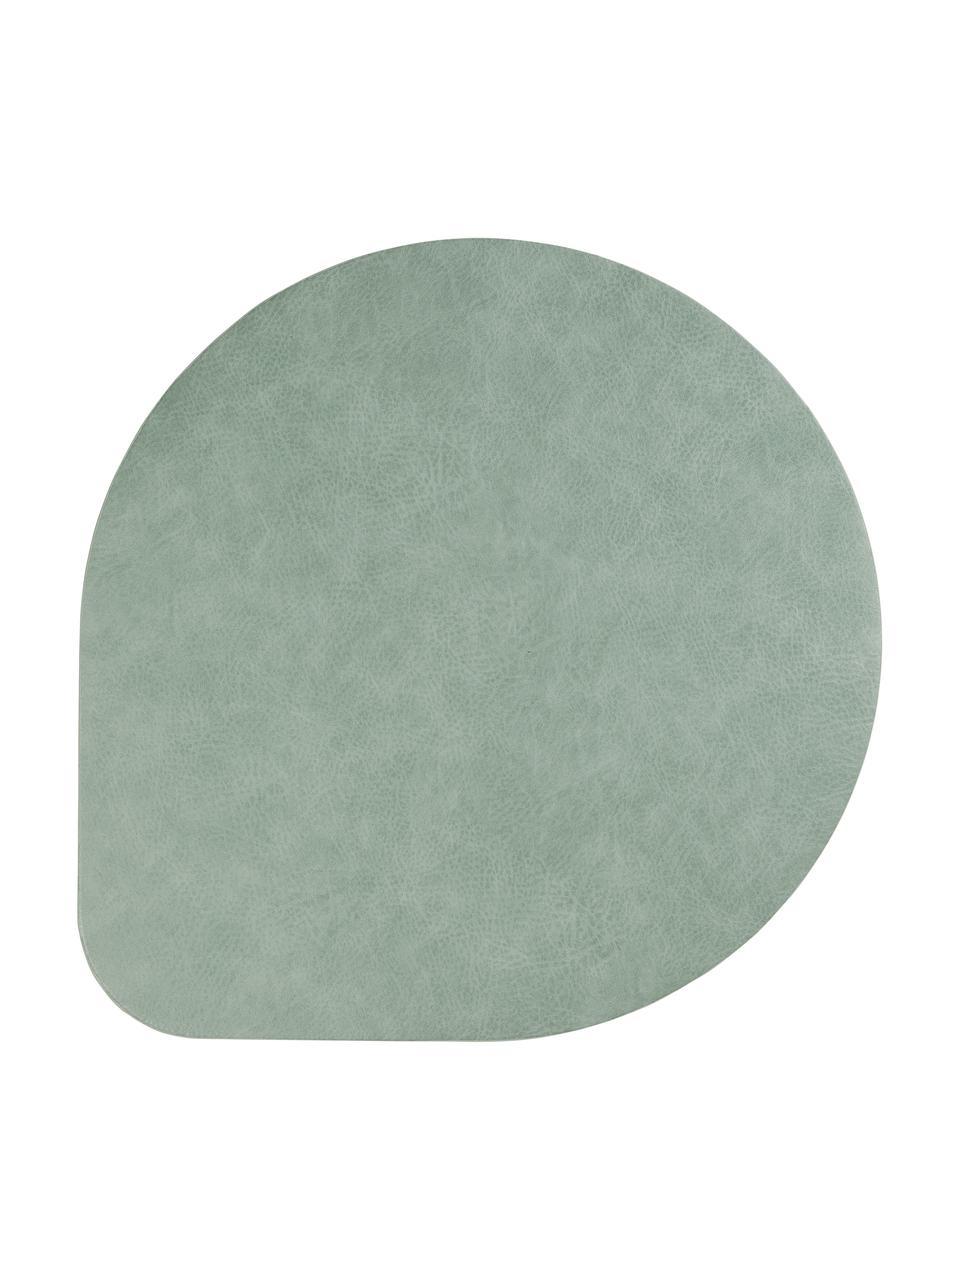 Kunstleder-Tischsets Povac, 2 Stück, Kunstleder (PVC), Mintgrün, Ø 37 cm